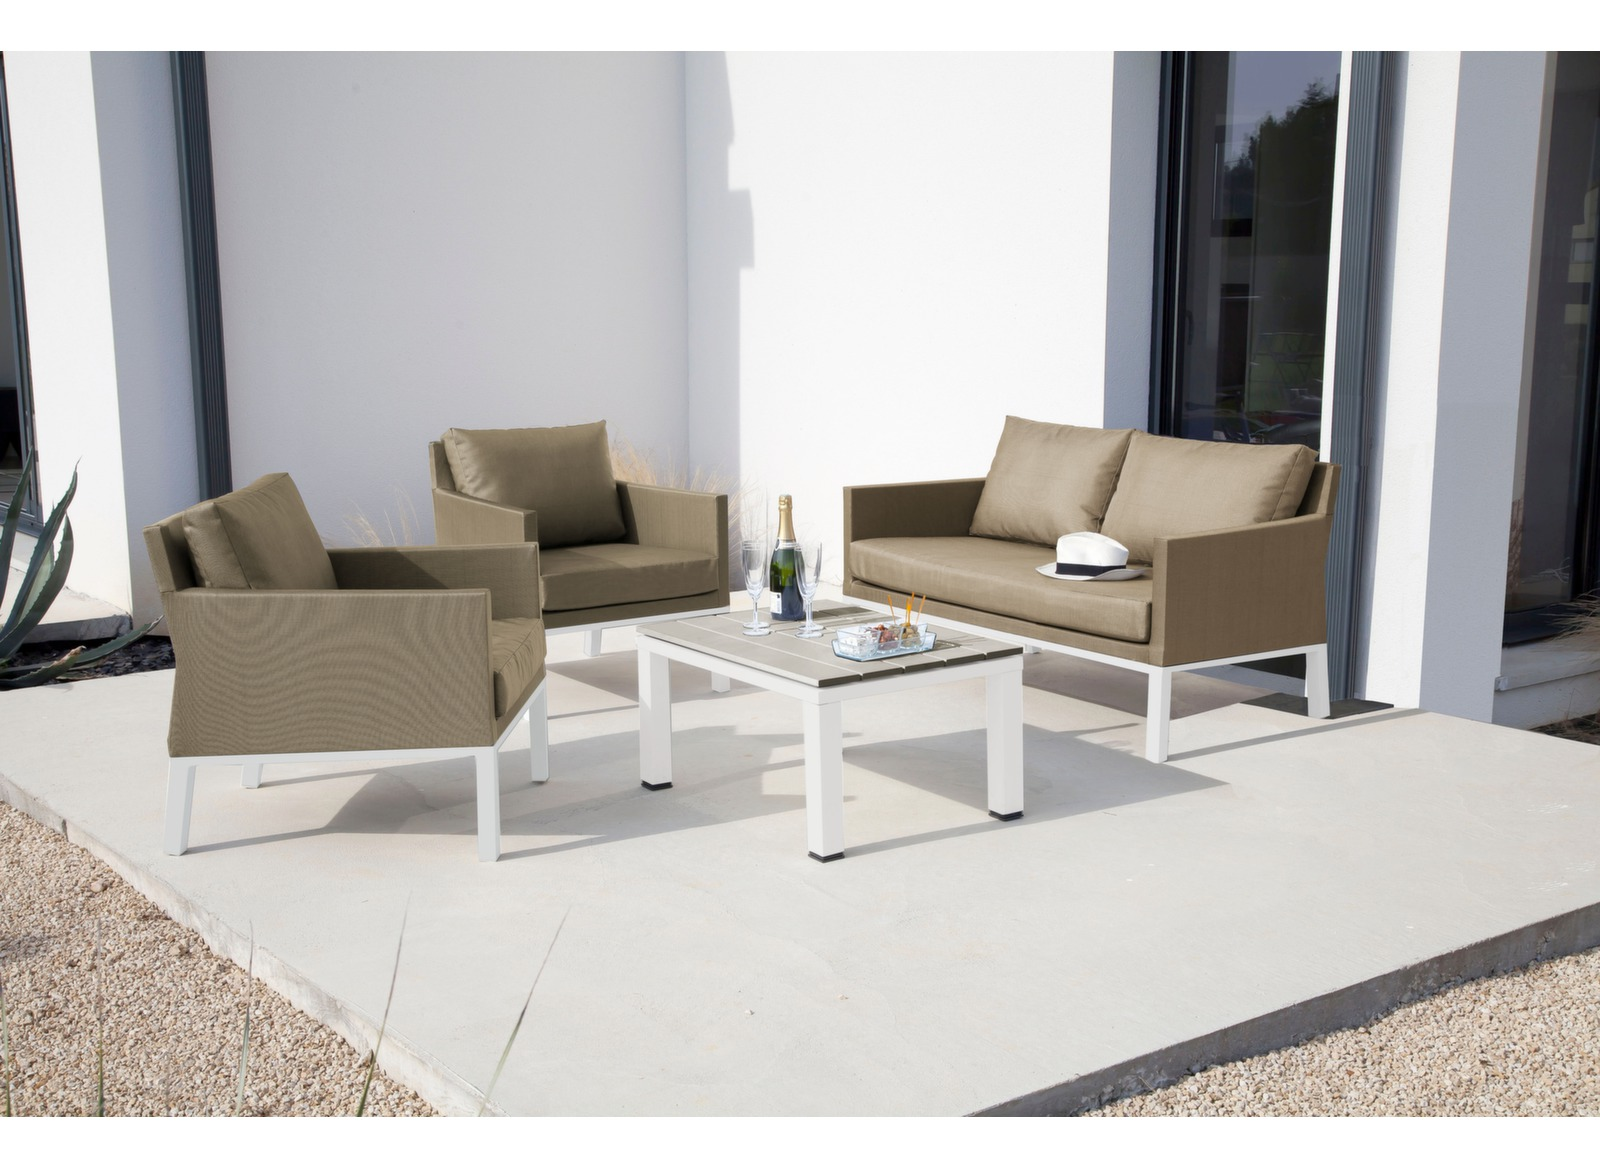 promotion canap de jardin 2 places table basse oslo. Black Bedroom Furniture Sets. Home Design Ideas